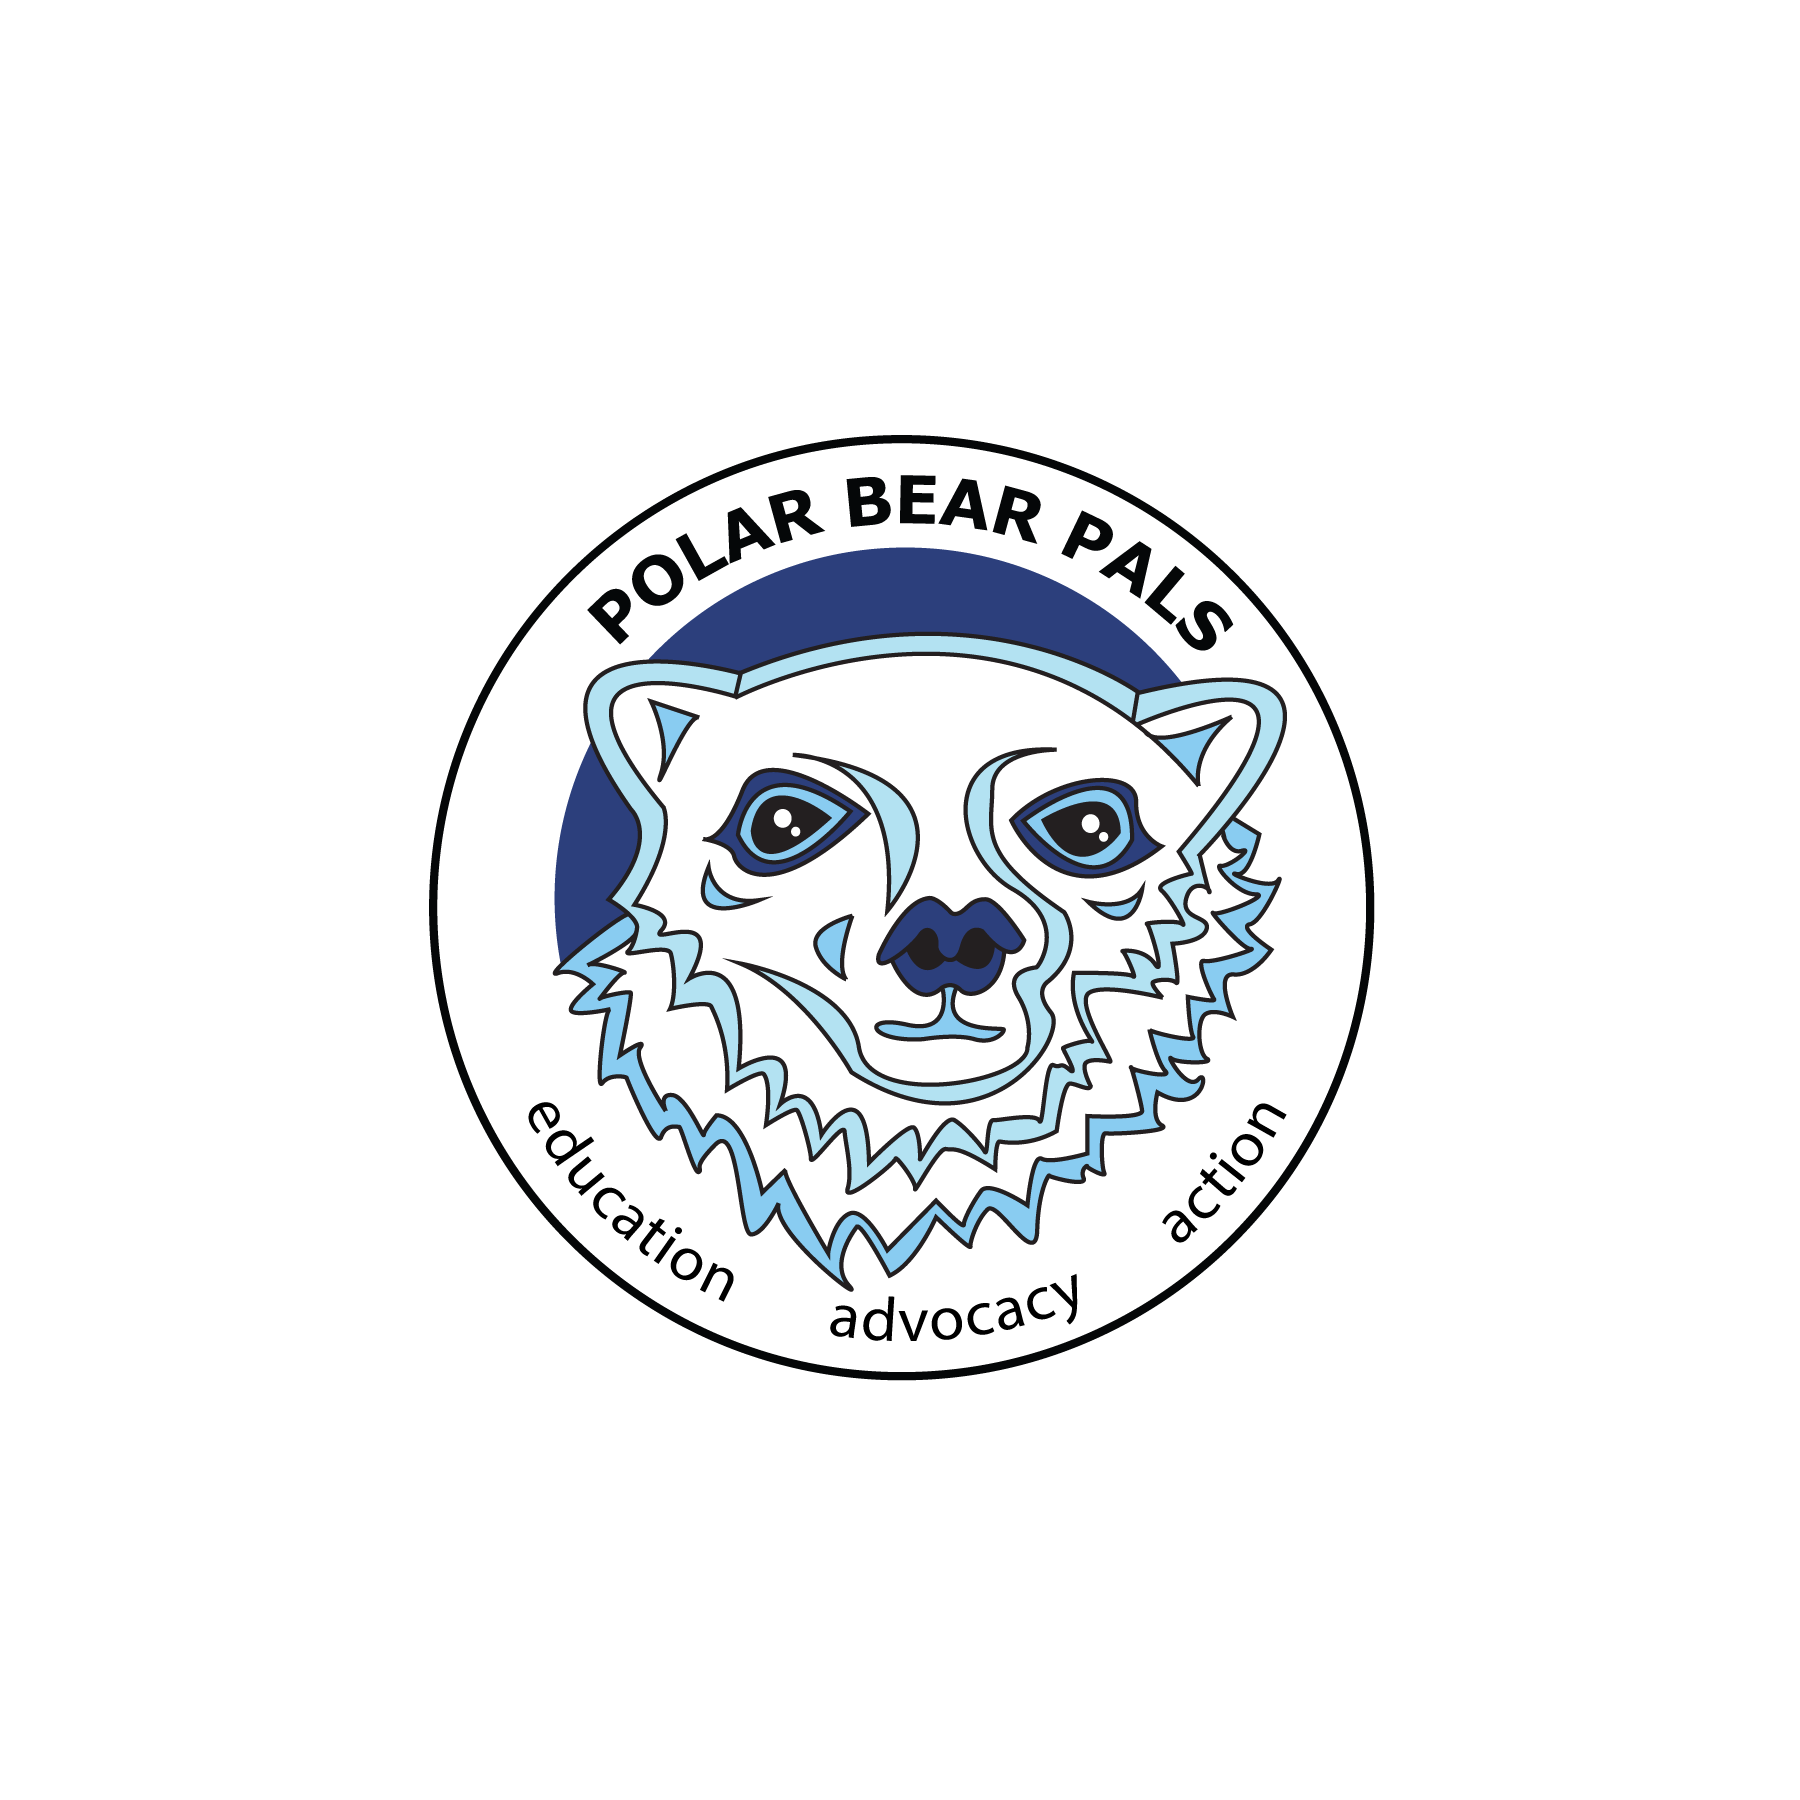 Polar Bear Pals Logo